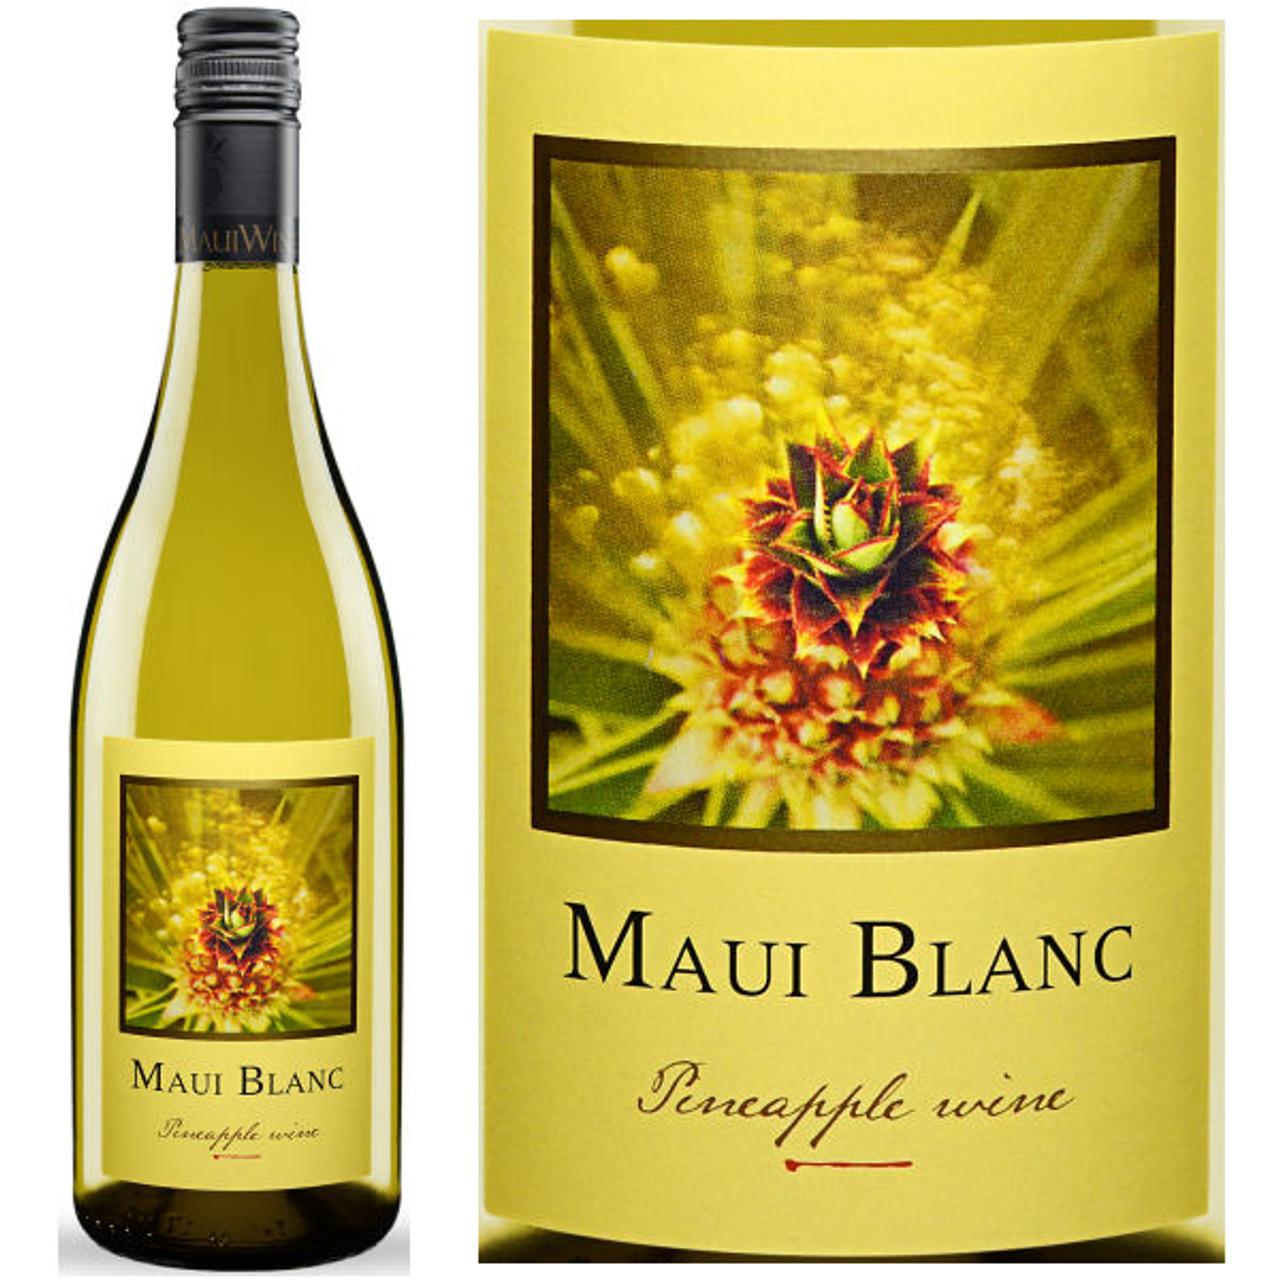 Maui Wine Maui Blanc Off-Dry Pineapple Wine NV (Hawaii)